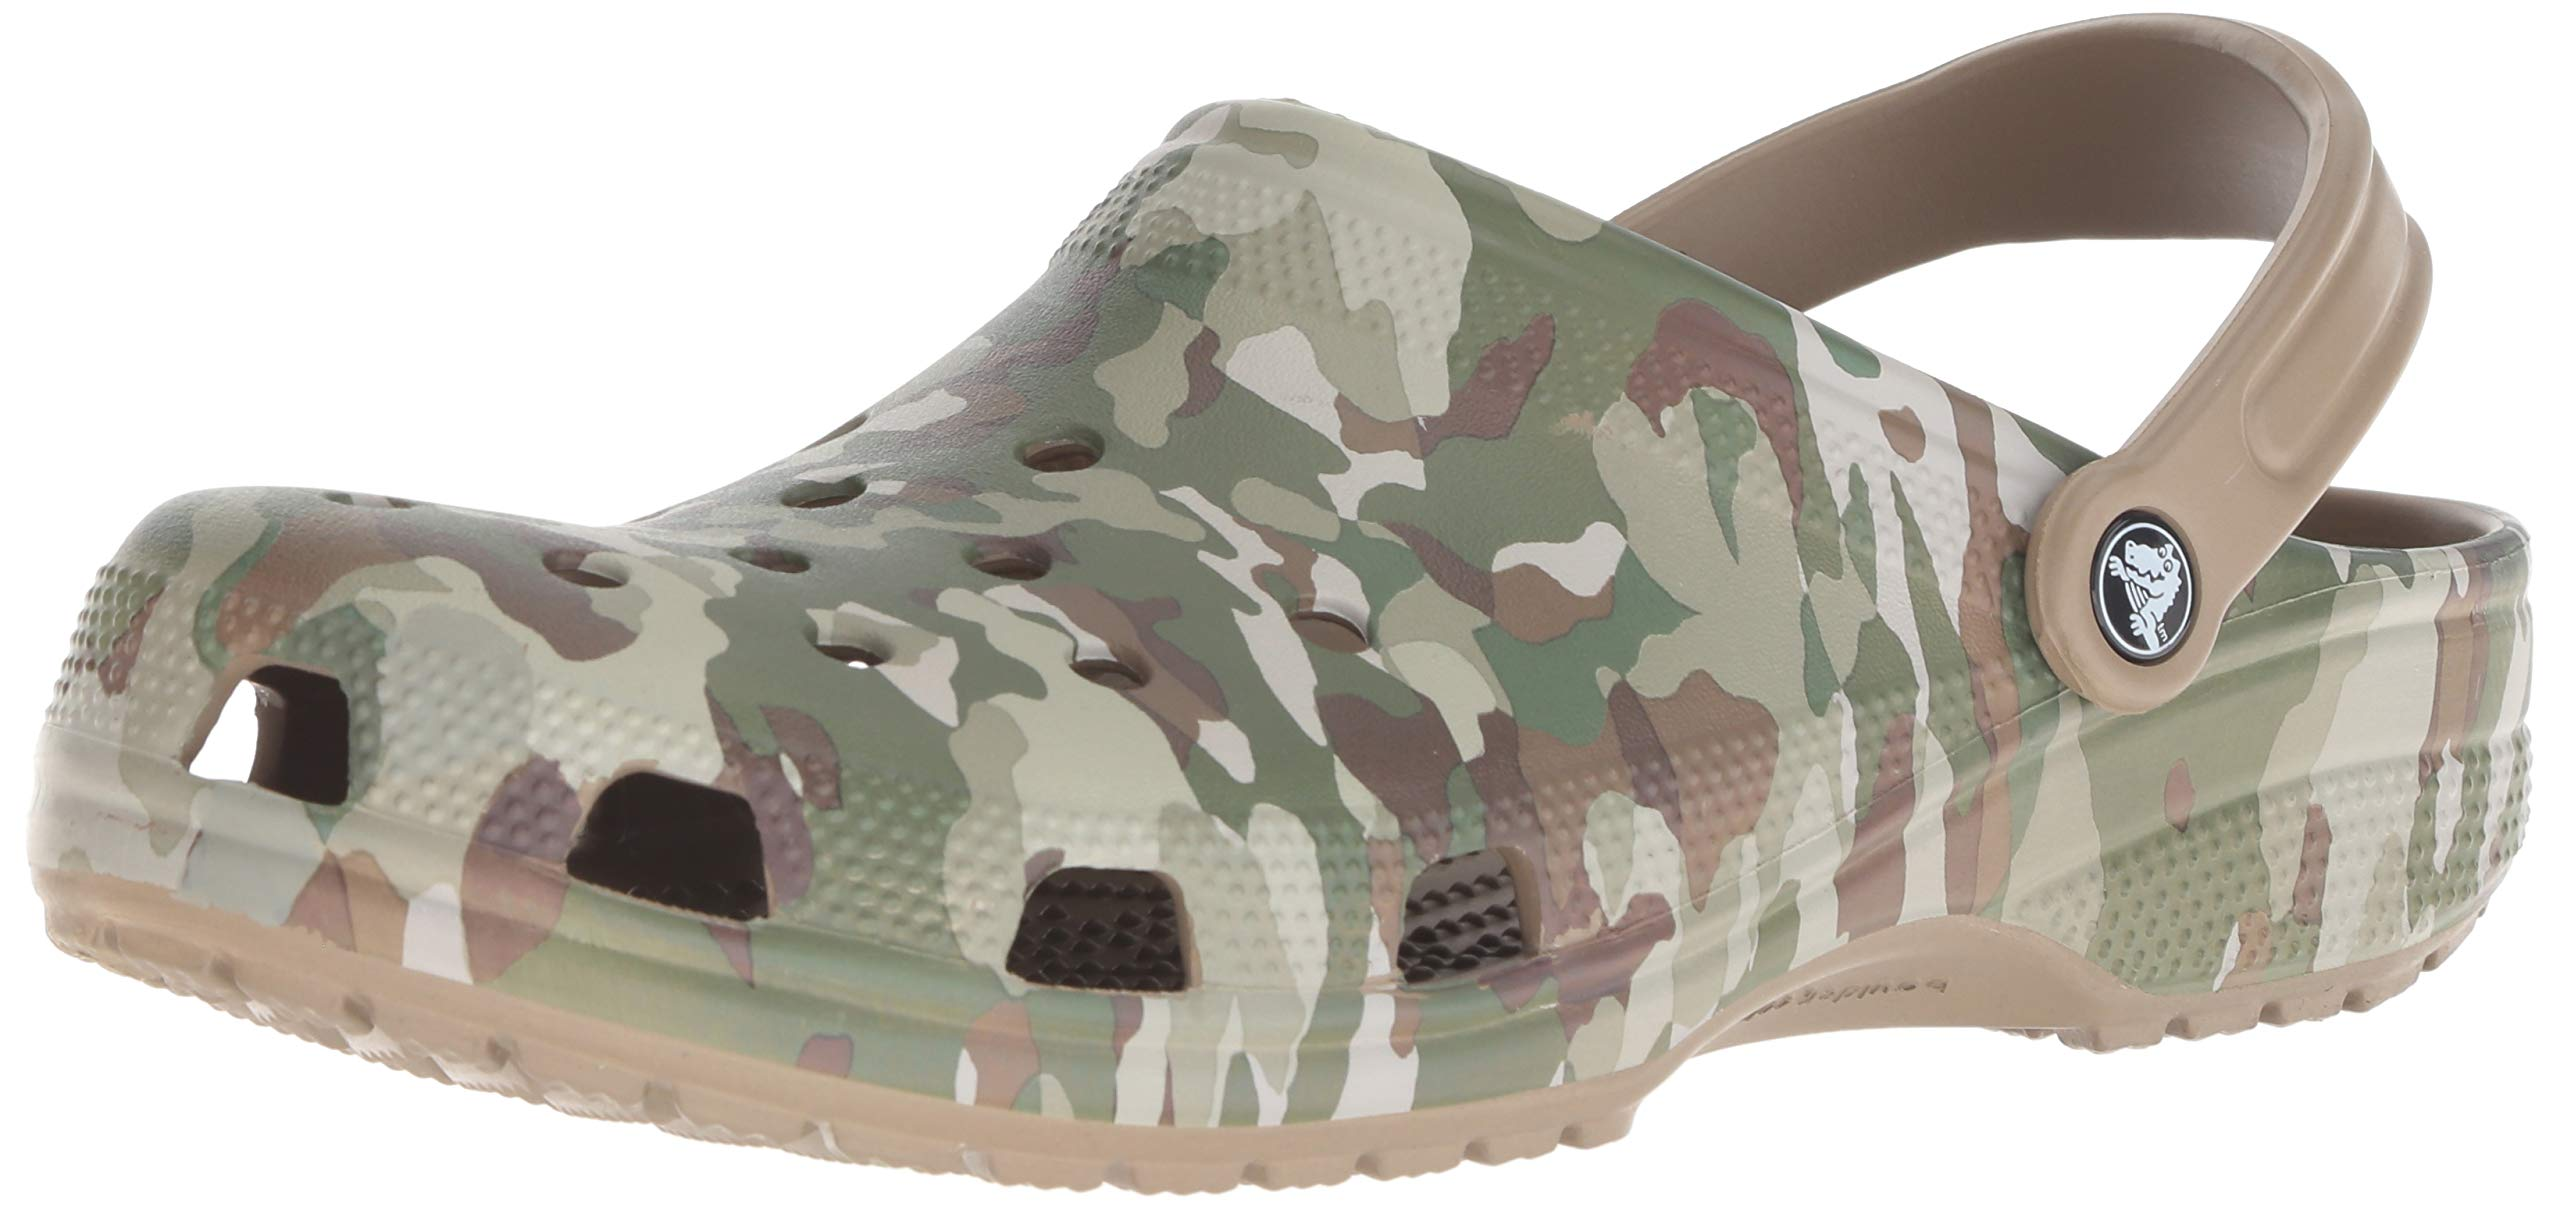 Crocs Classic Graphic Clog, dark camo green/khaki, 13 US Men/ 15 US Women